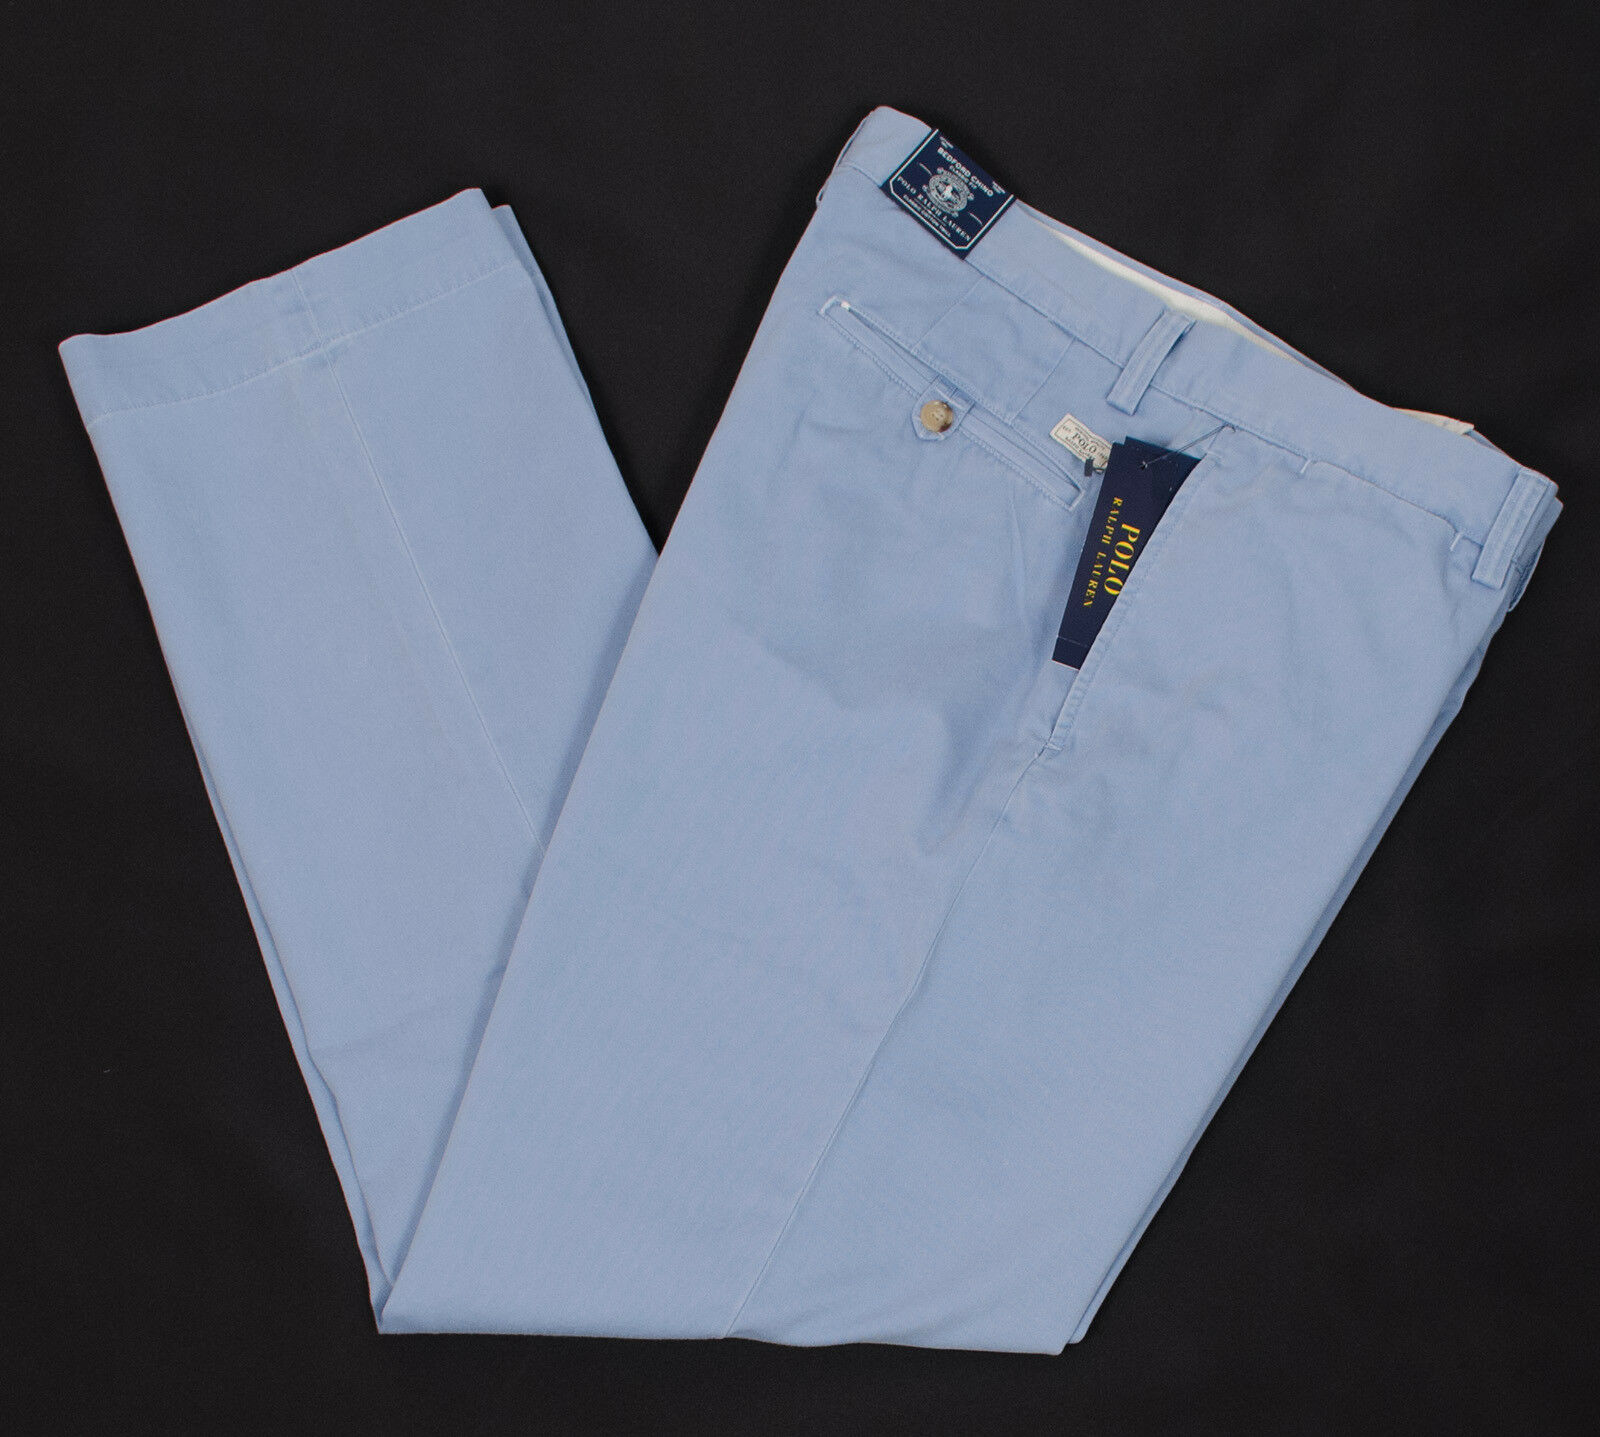 POLO RALPH LAUREN BEDFORD MEN'S CLASSIC FIT FLAT FRONT blueE PANTS MUTISIZE